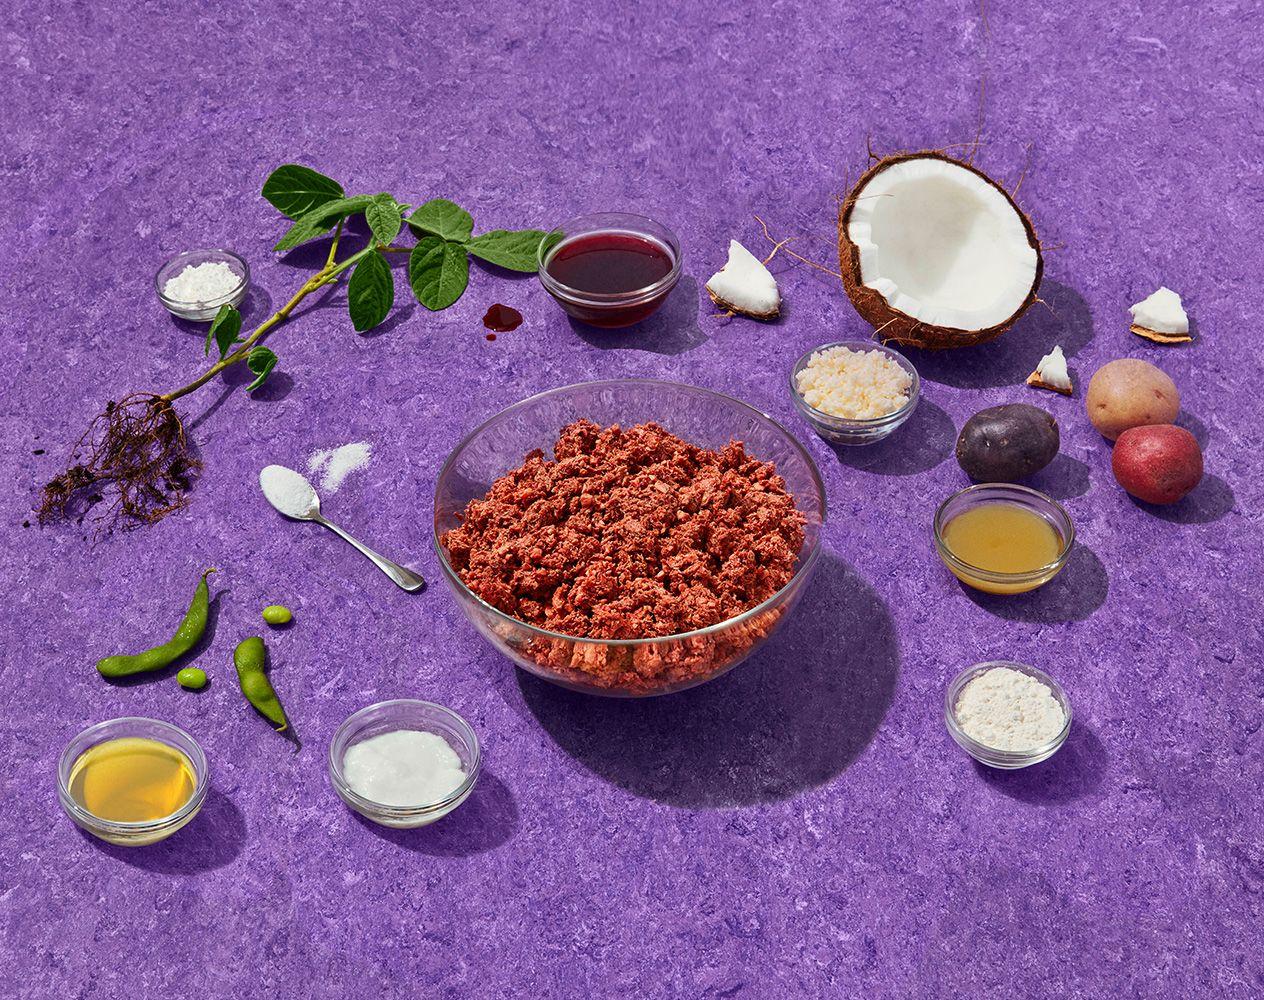 Home Food Ingredients Still 1264x1000